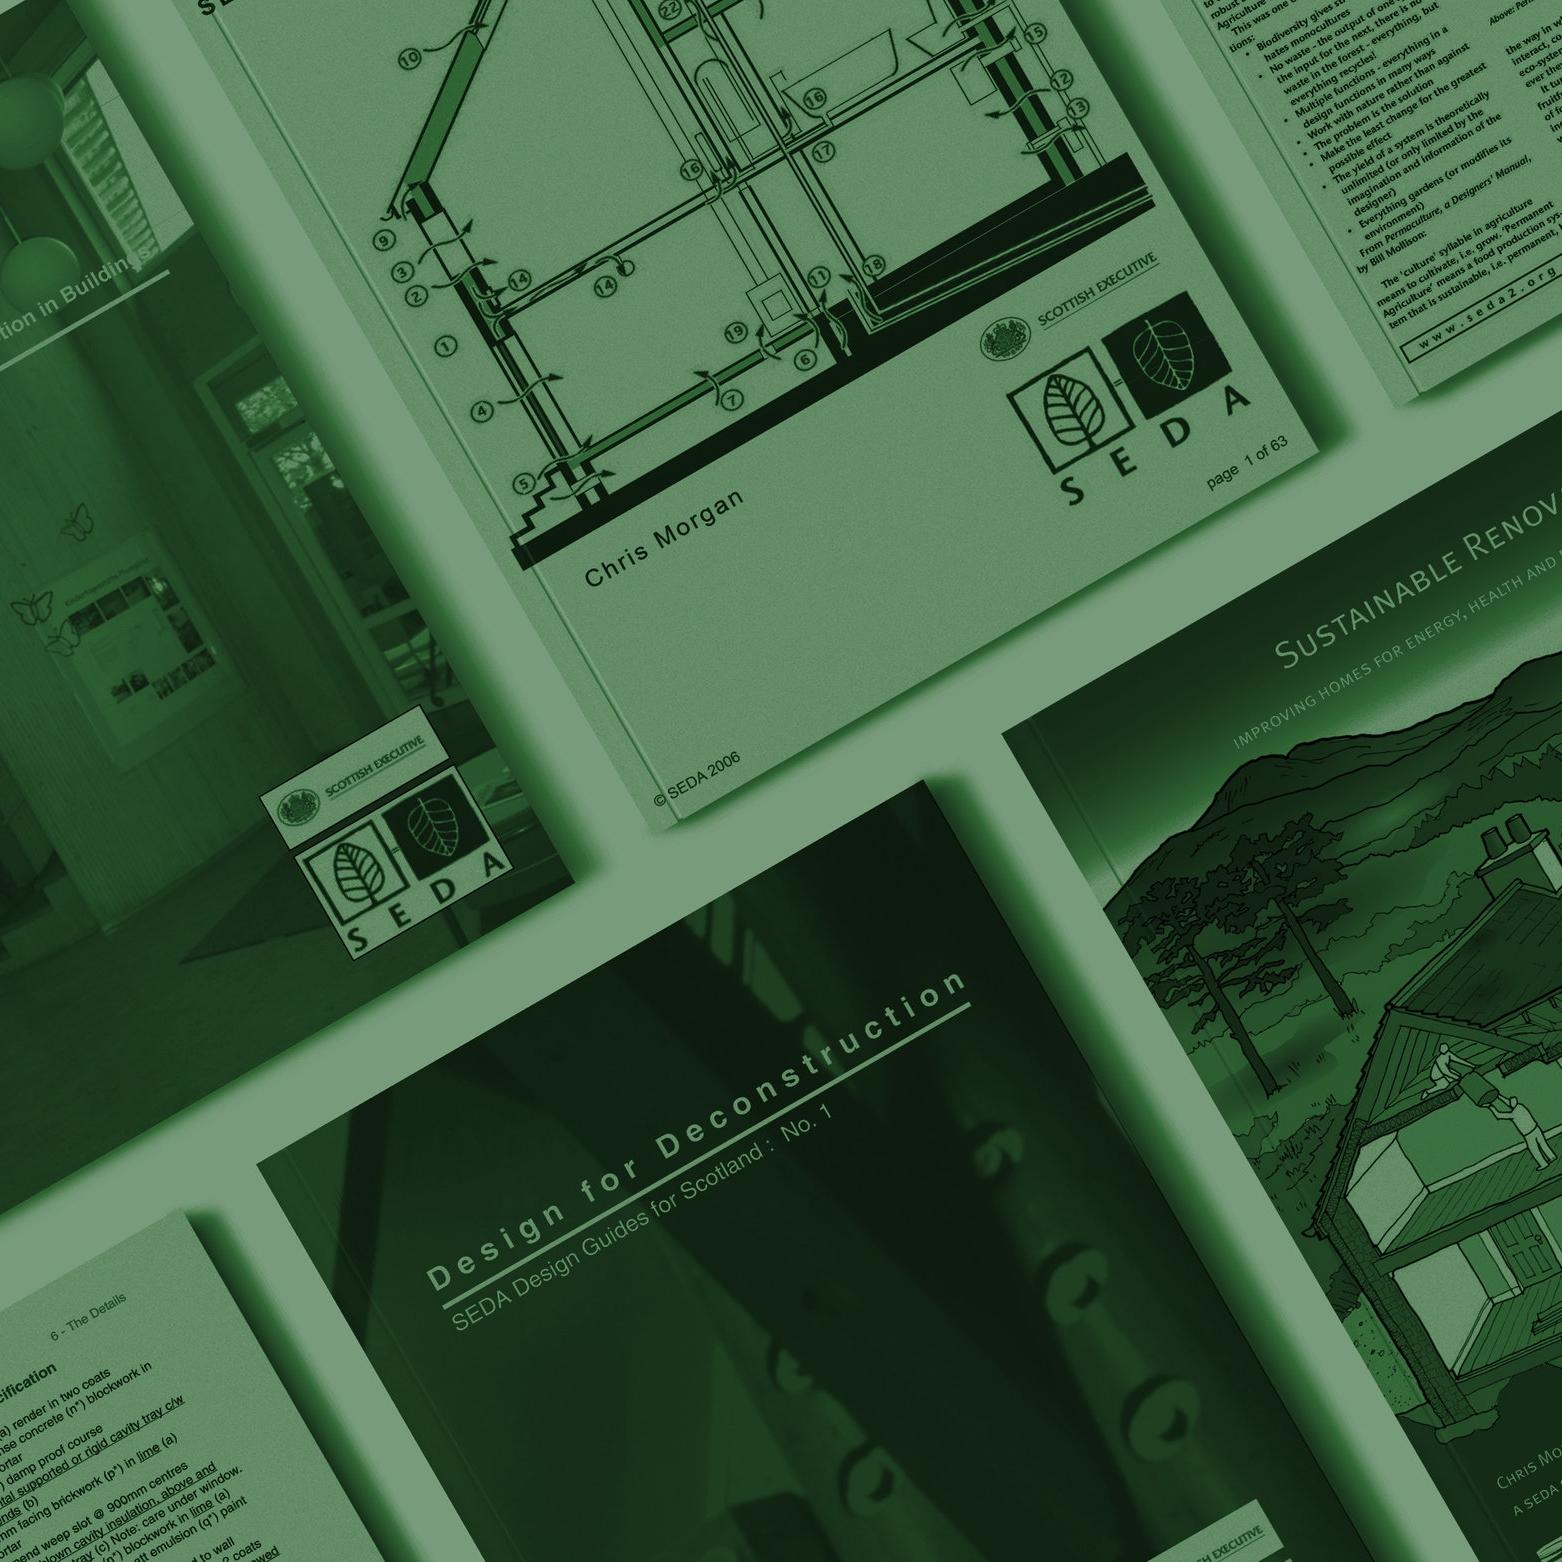 - Design Guides